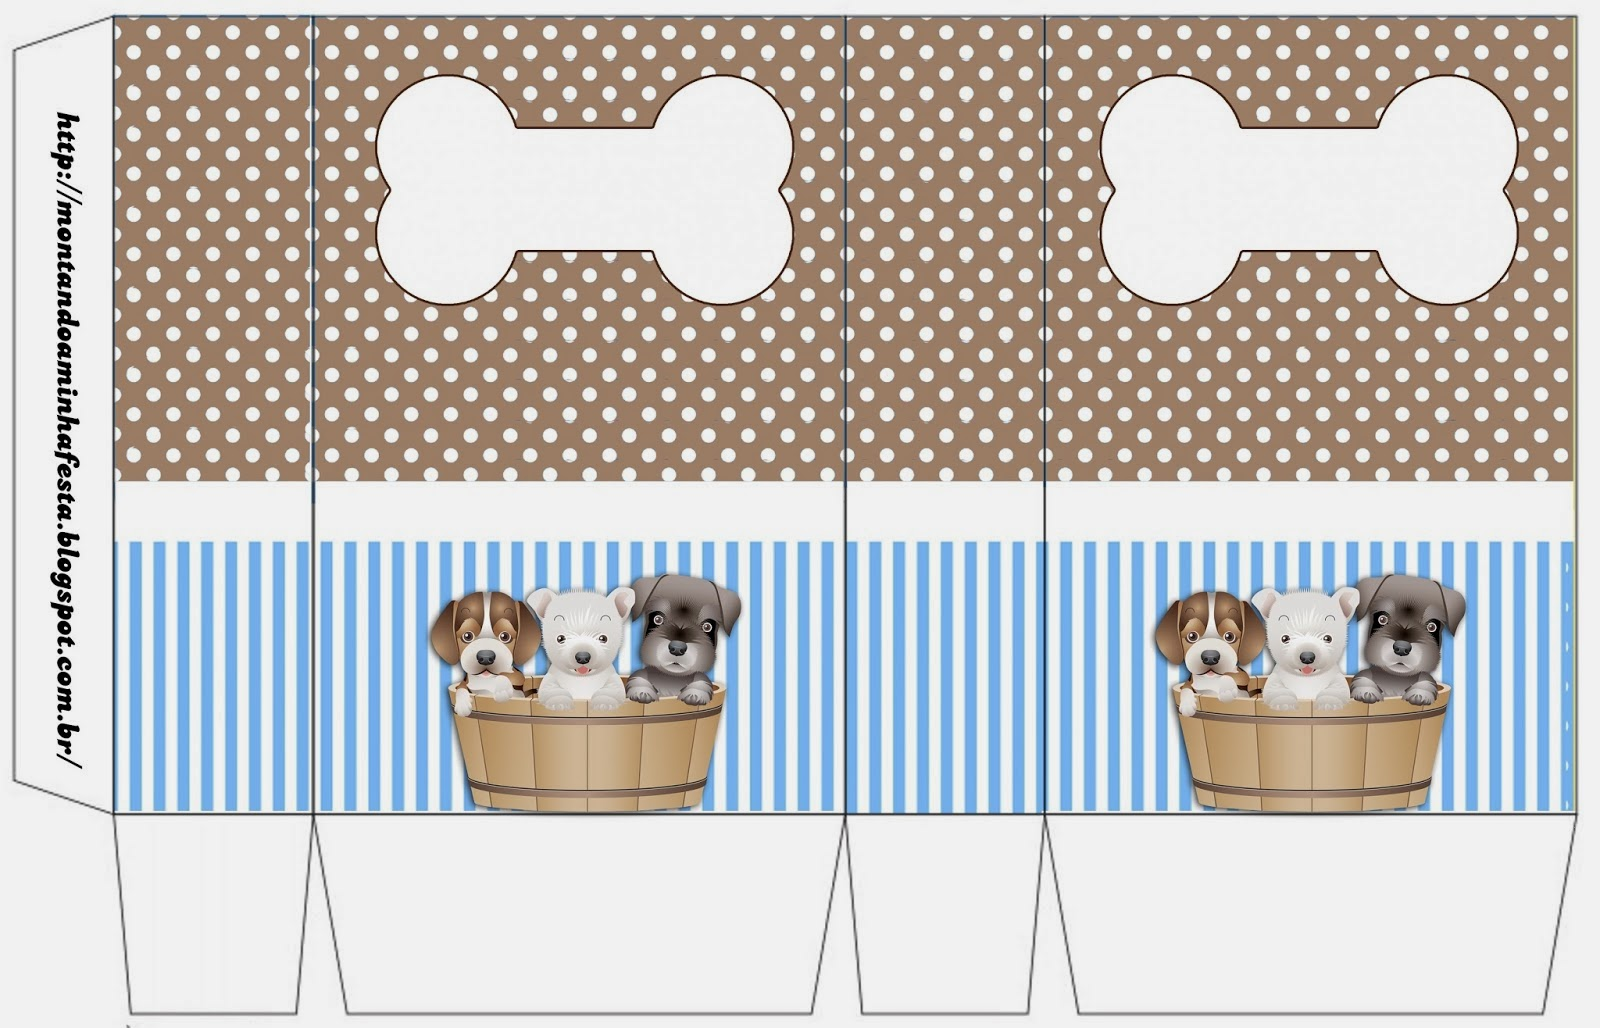 Perritos: Cajas para Imprimir Gratis. | Ideas y material gratis para ...